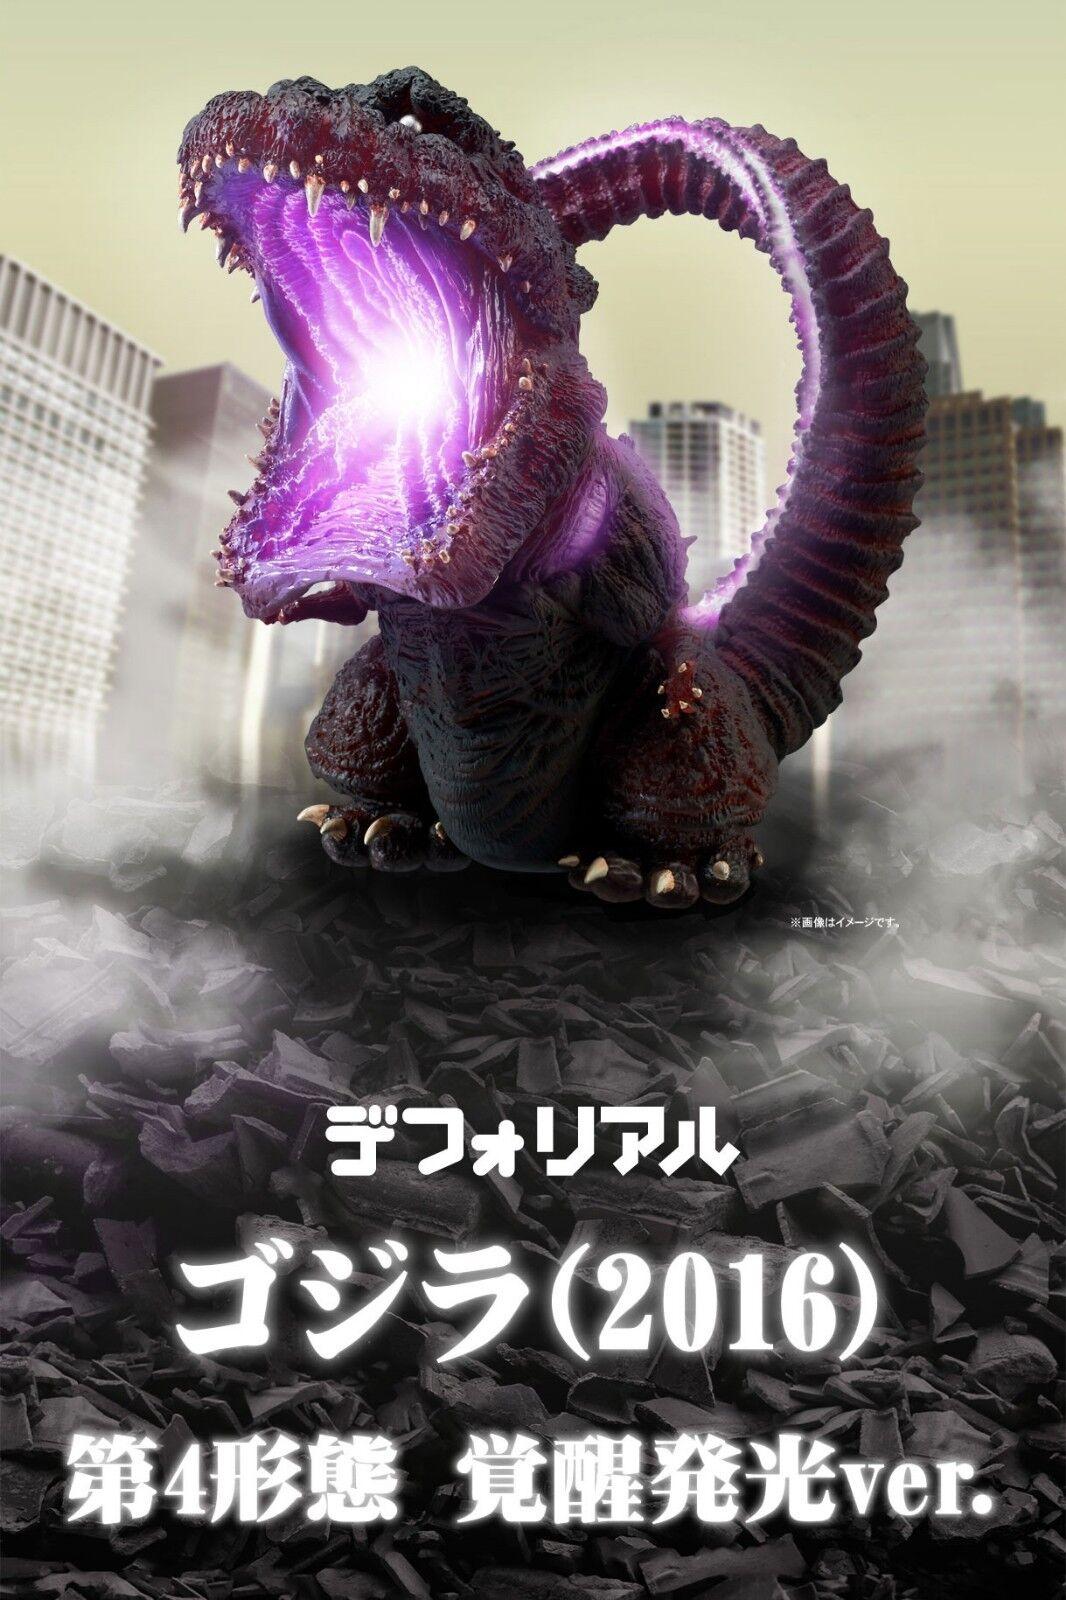 DefoReal Godzilla 2016 4th Awakening Lighting Series Versión X-Plus Defo Real